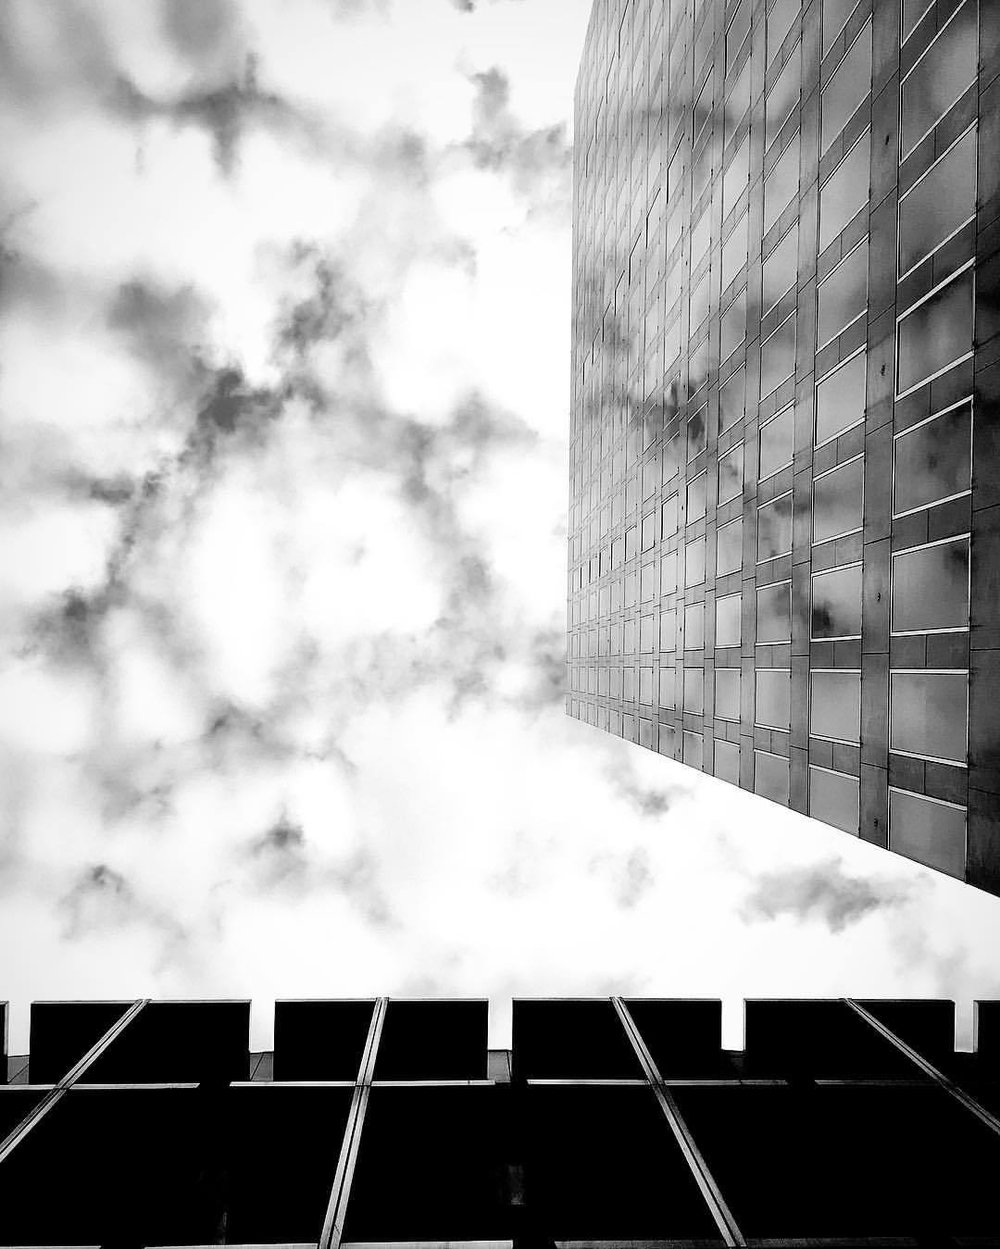 glass // clouds // beams  •  •  •  •  •  #seemycity #stayandwander #myfeatureshoot #mocorocreative #createexplore #cntraveler #thecreatorclass #myfeatureshoot #mkexplore #mytinyatlas #artofvisuals #aov #global_hotshotz #folkgood #beautifuldestinations #passionpassport #exploretocreate #visualsoflife #visualsofearth #thecoolmagazine #illgrammers #ilovelondon #londonist #shotoniphone #thisinstagramlife #ig_uk #ig_london #architecture #londonforlife (at London, United Kingdom)